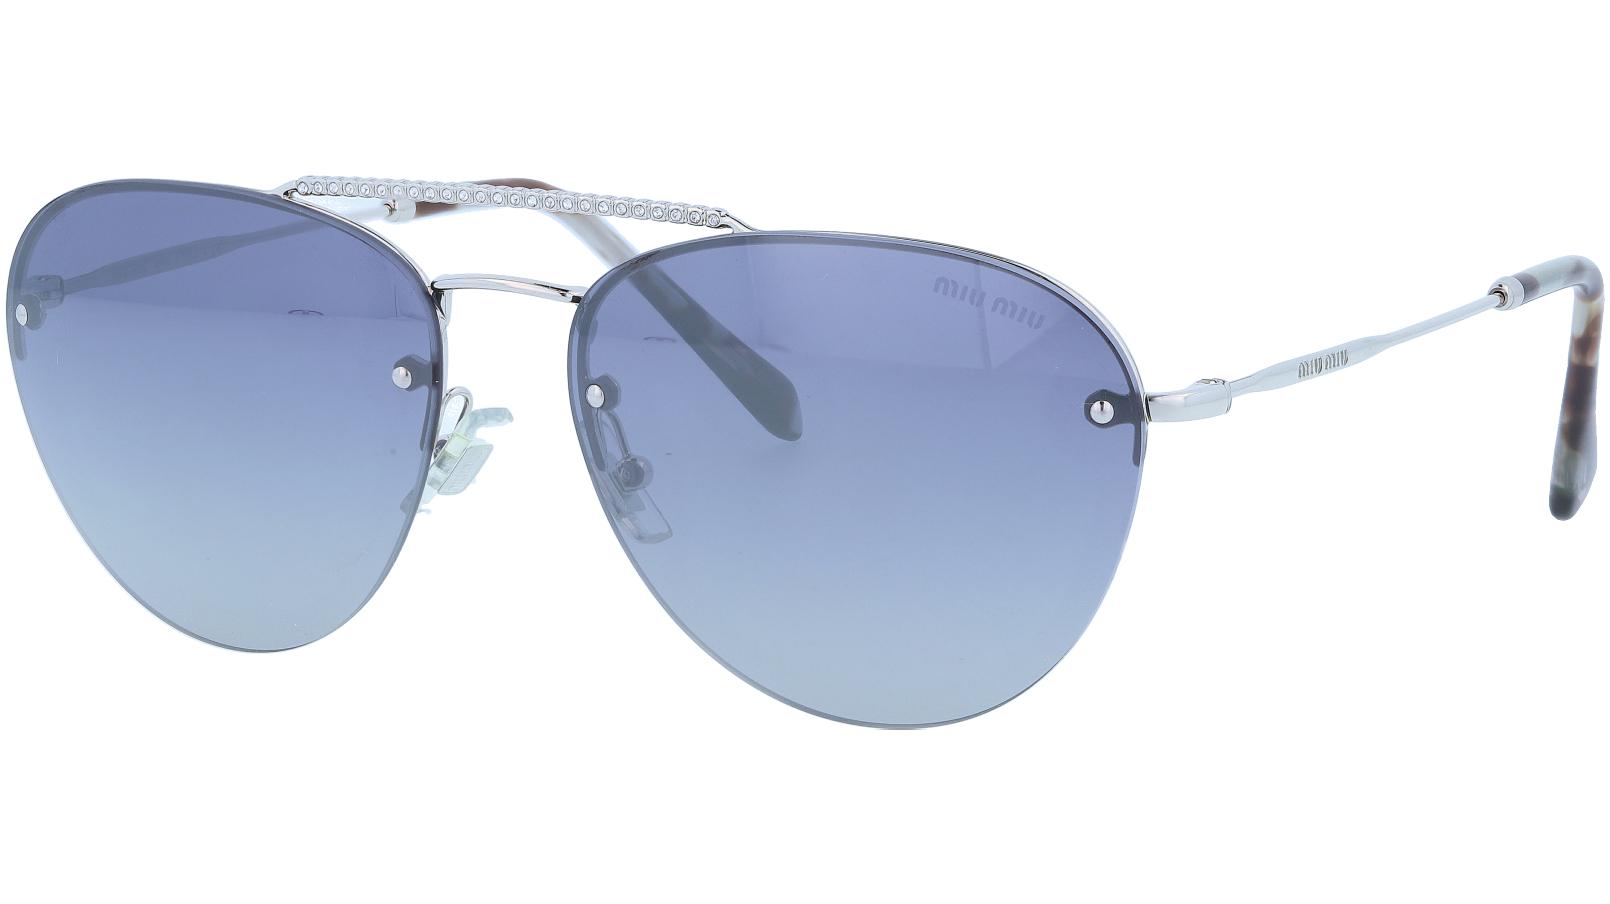 MIU MIU MU54US 1BC3A0 59 Grey Aviator Sunglasses